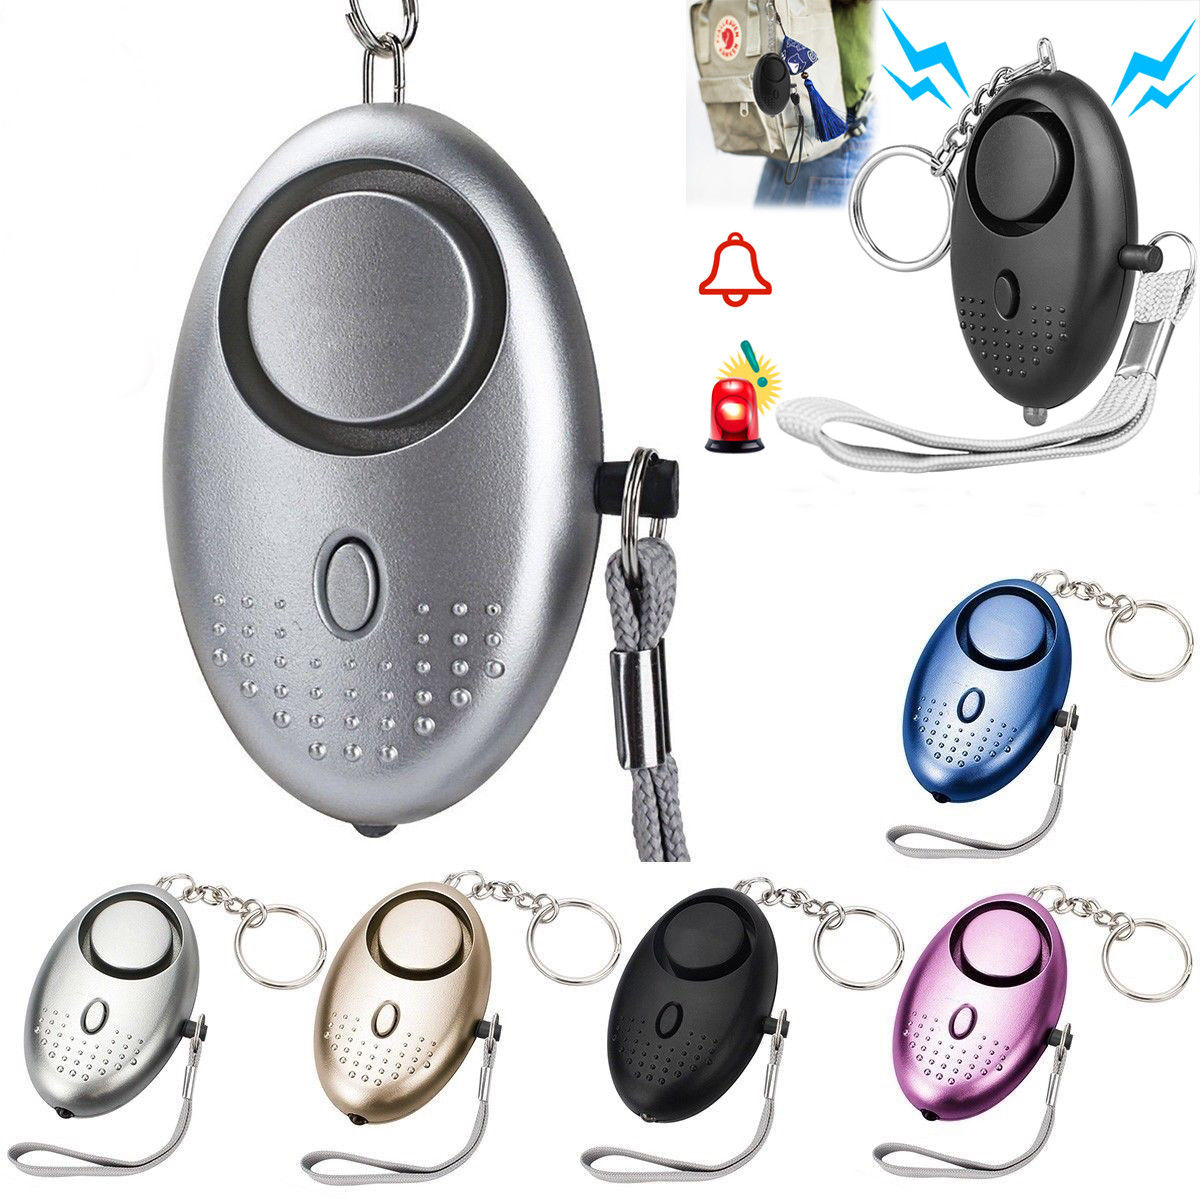 Self Defense Alarm Girl Women Kids Security Protect Alert Personal Safety Scream Loud Keychain Emergency Alarm